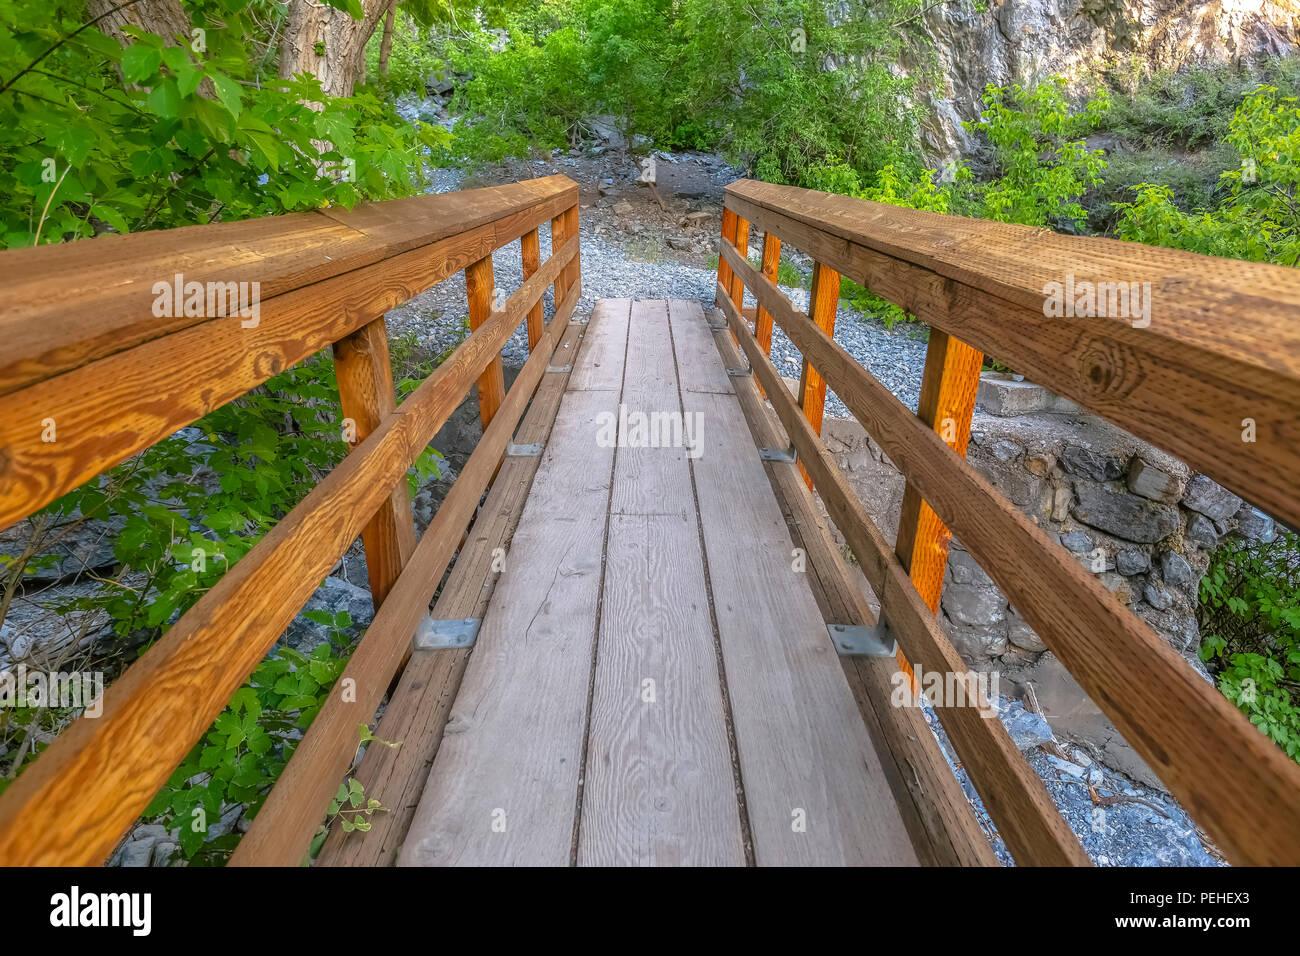 Standing on wooden bridge over rocky stream - Stock Image